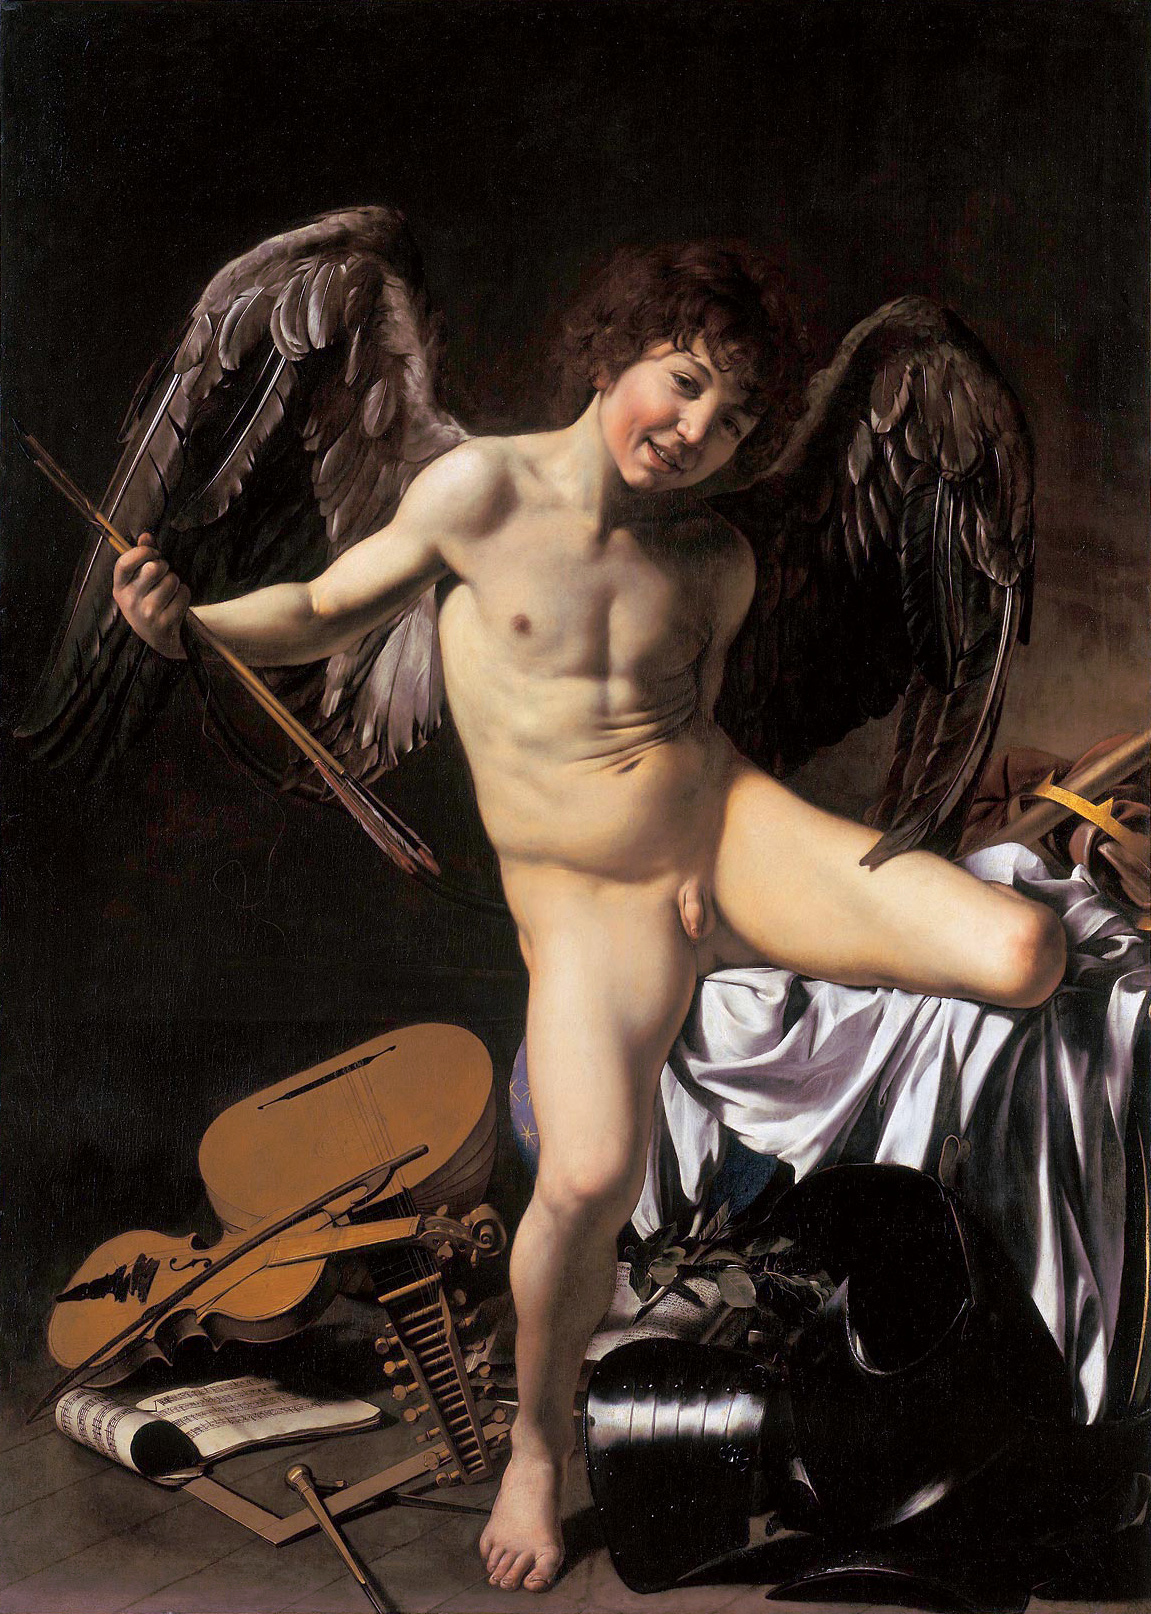 Michelangelo Merisi da Caravaggio, Amor Vincit Omnia (1602). Photoa via Wikimedia Commons.